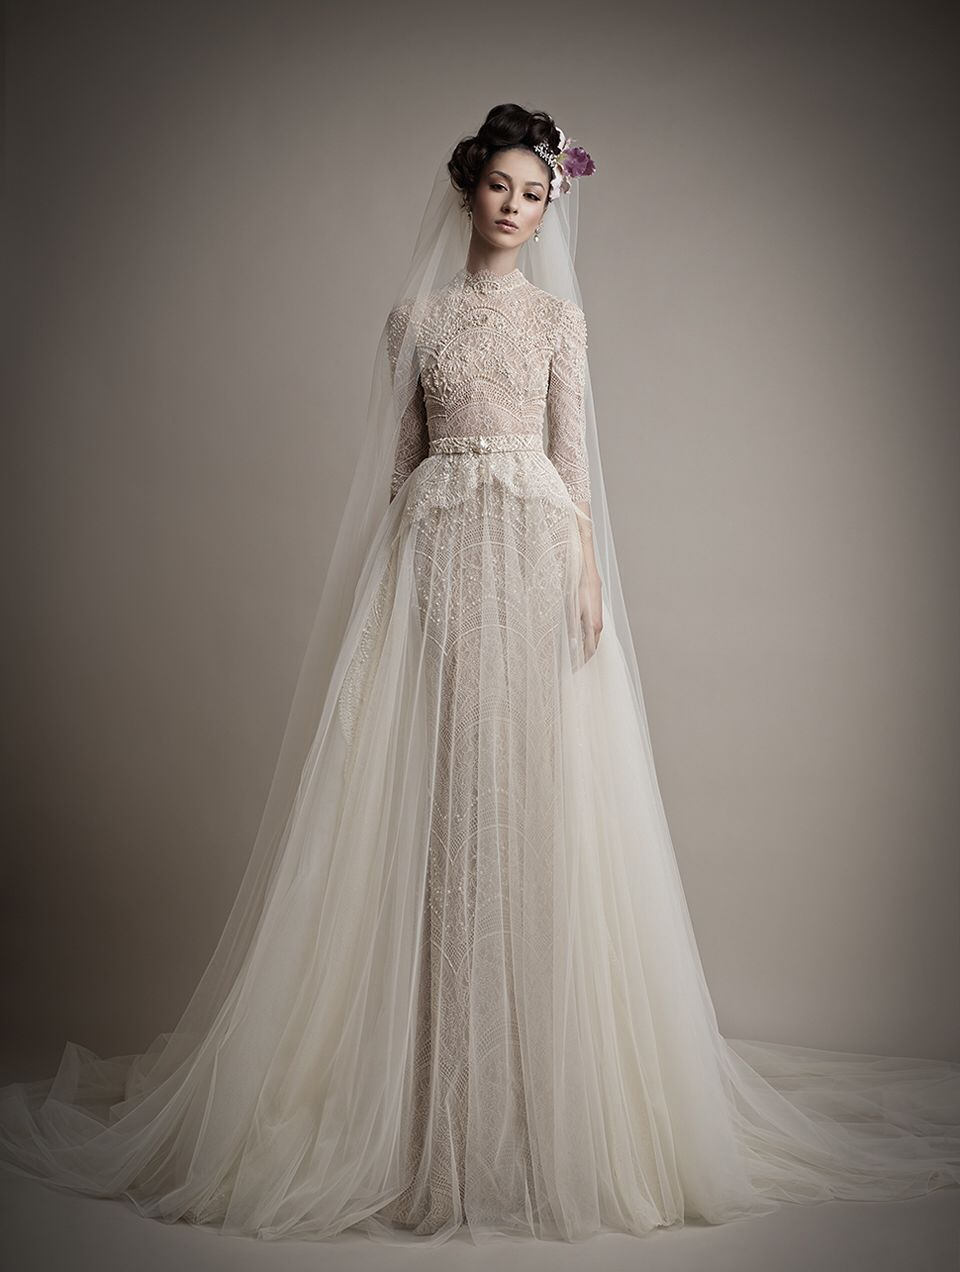 Pin by pia skalshøi on brudekjoler pinterest dress collection